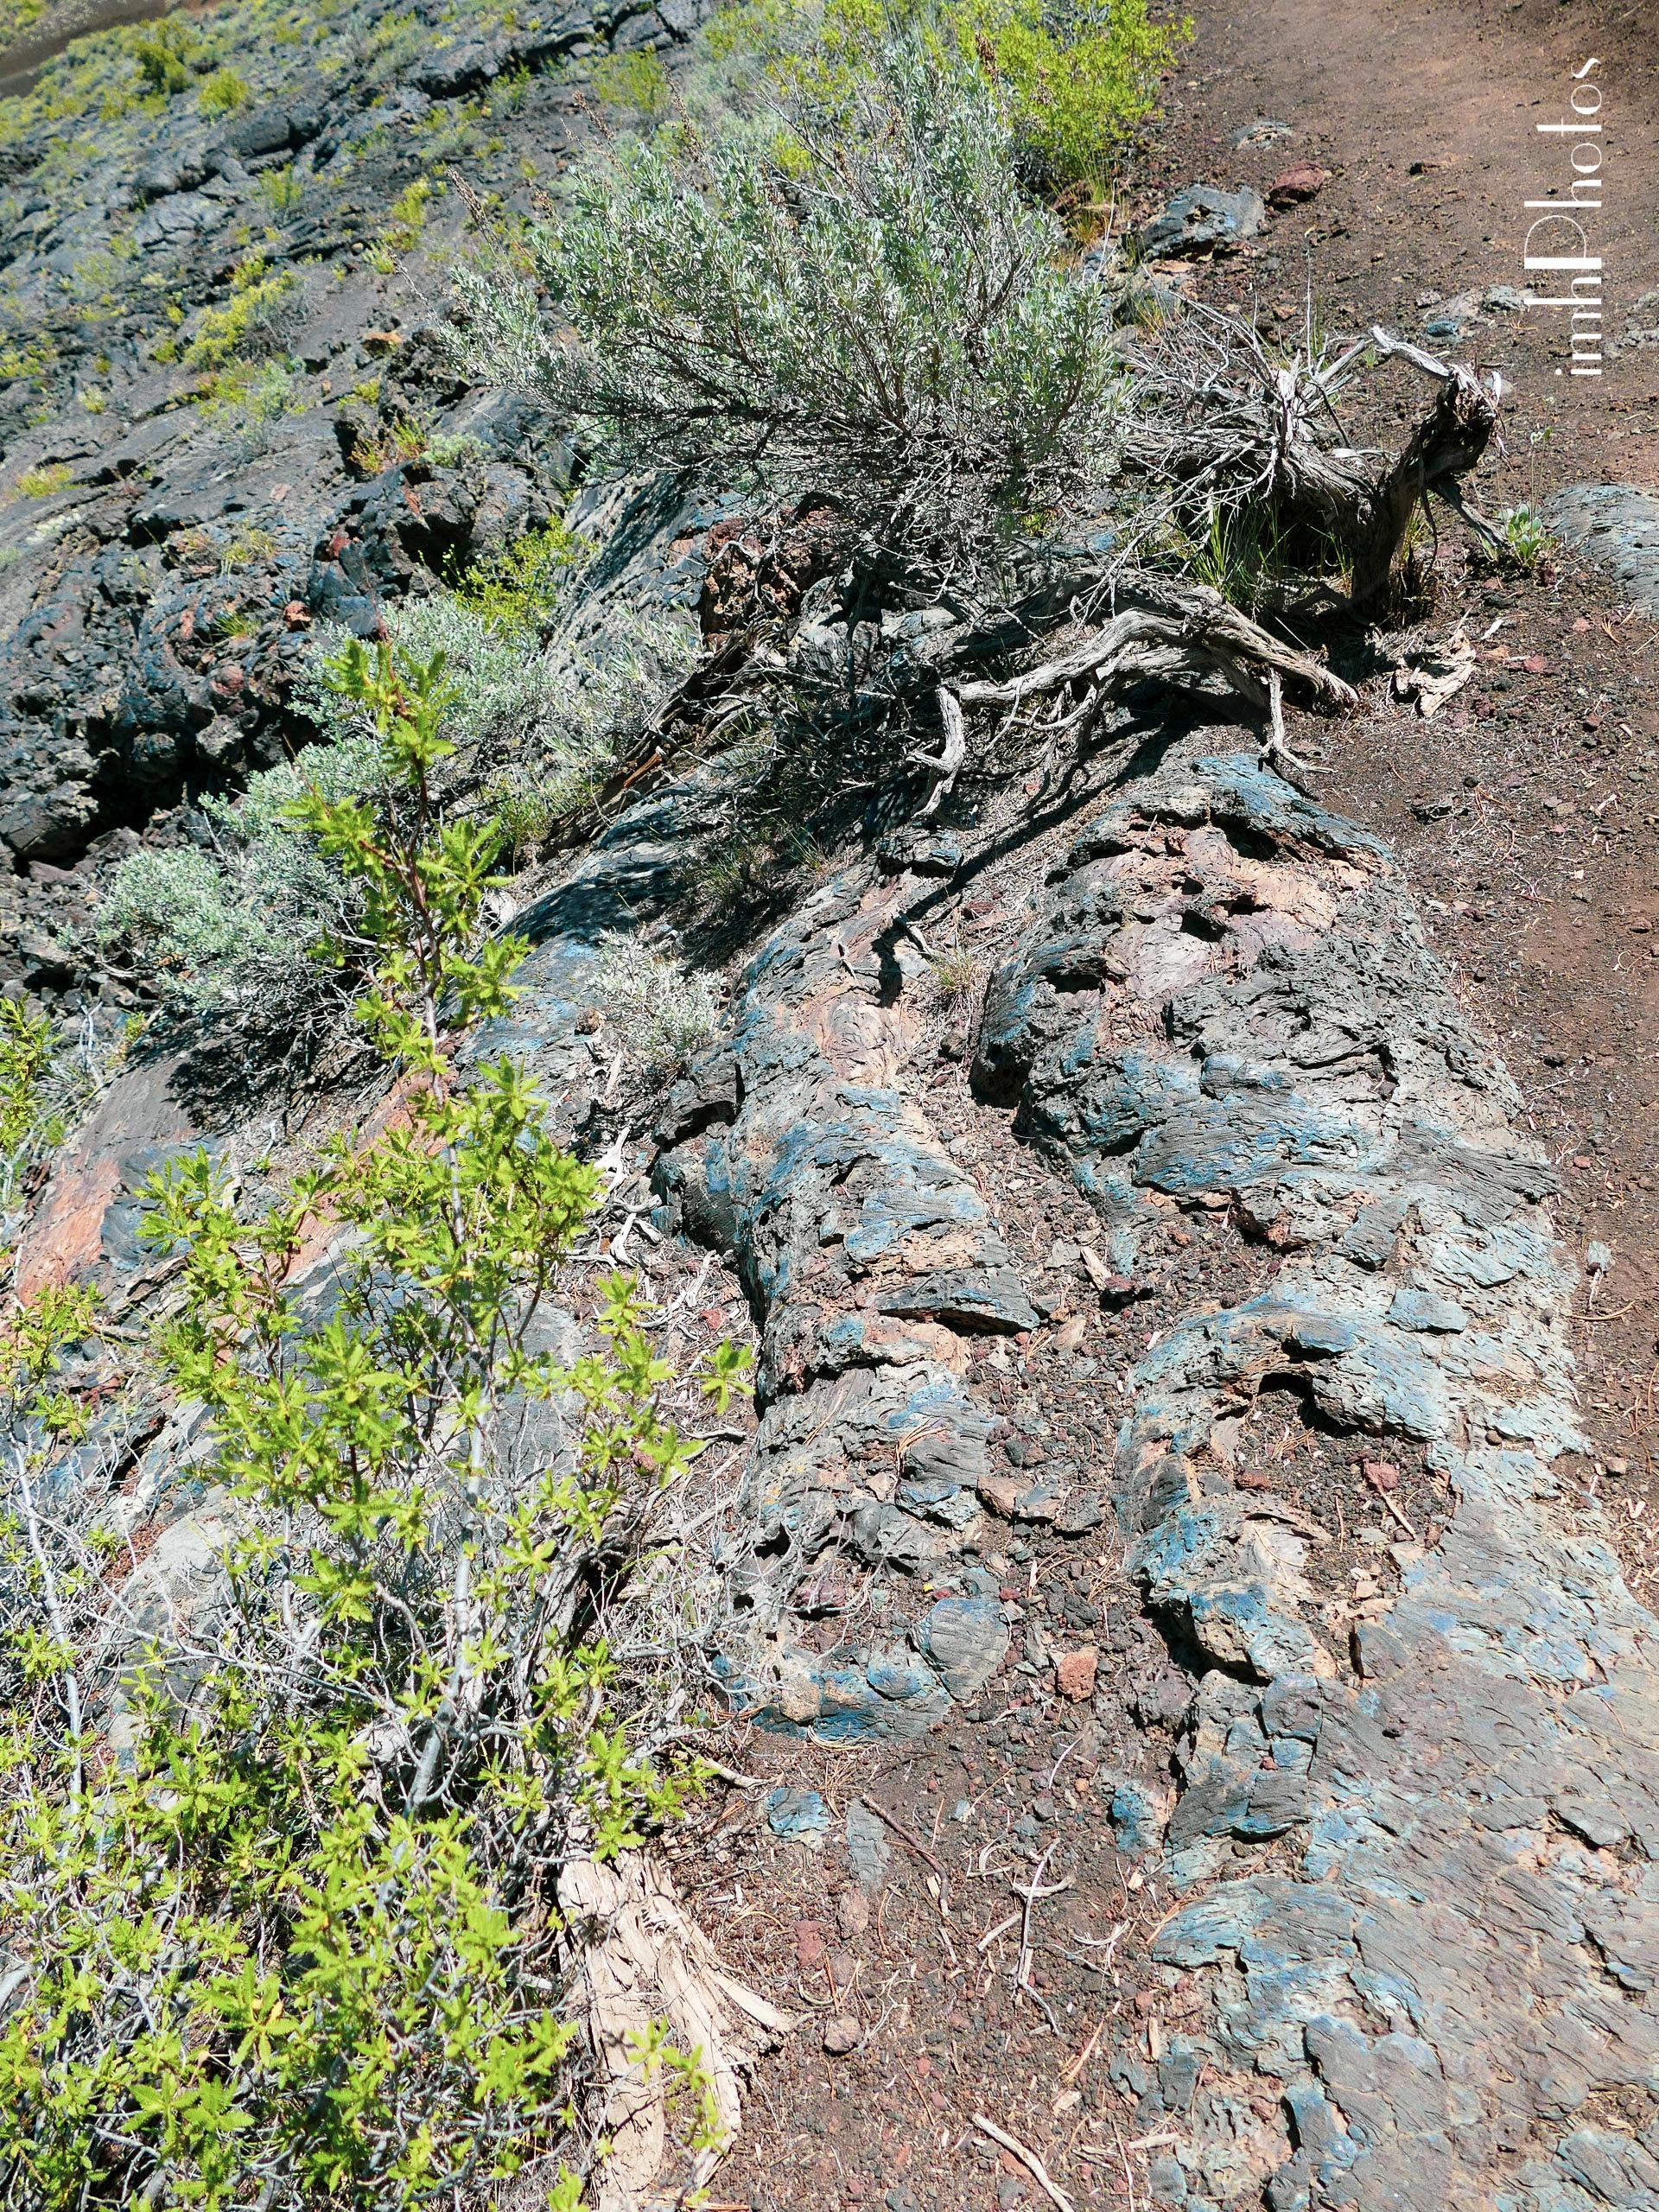 Blue Dragon Pahoehoe lava